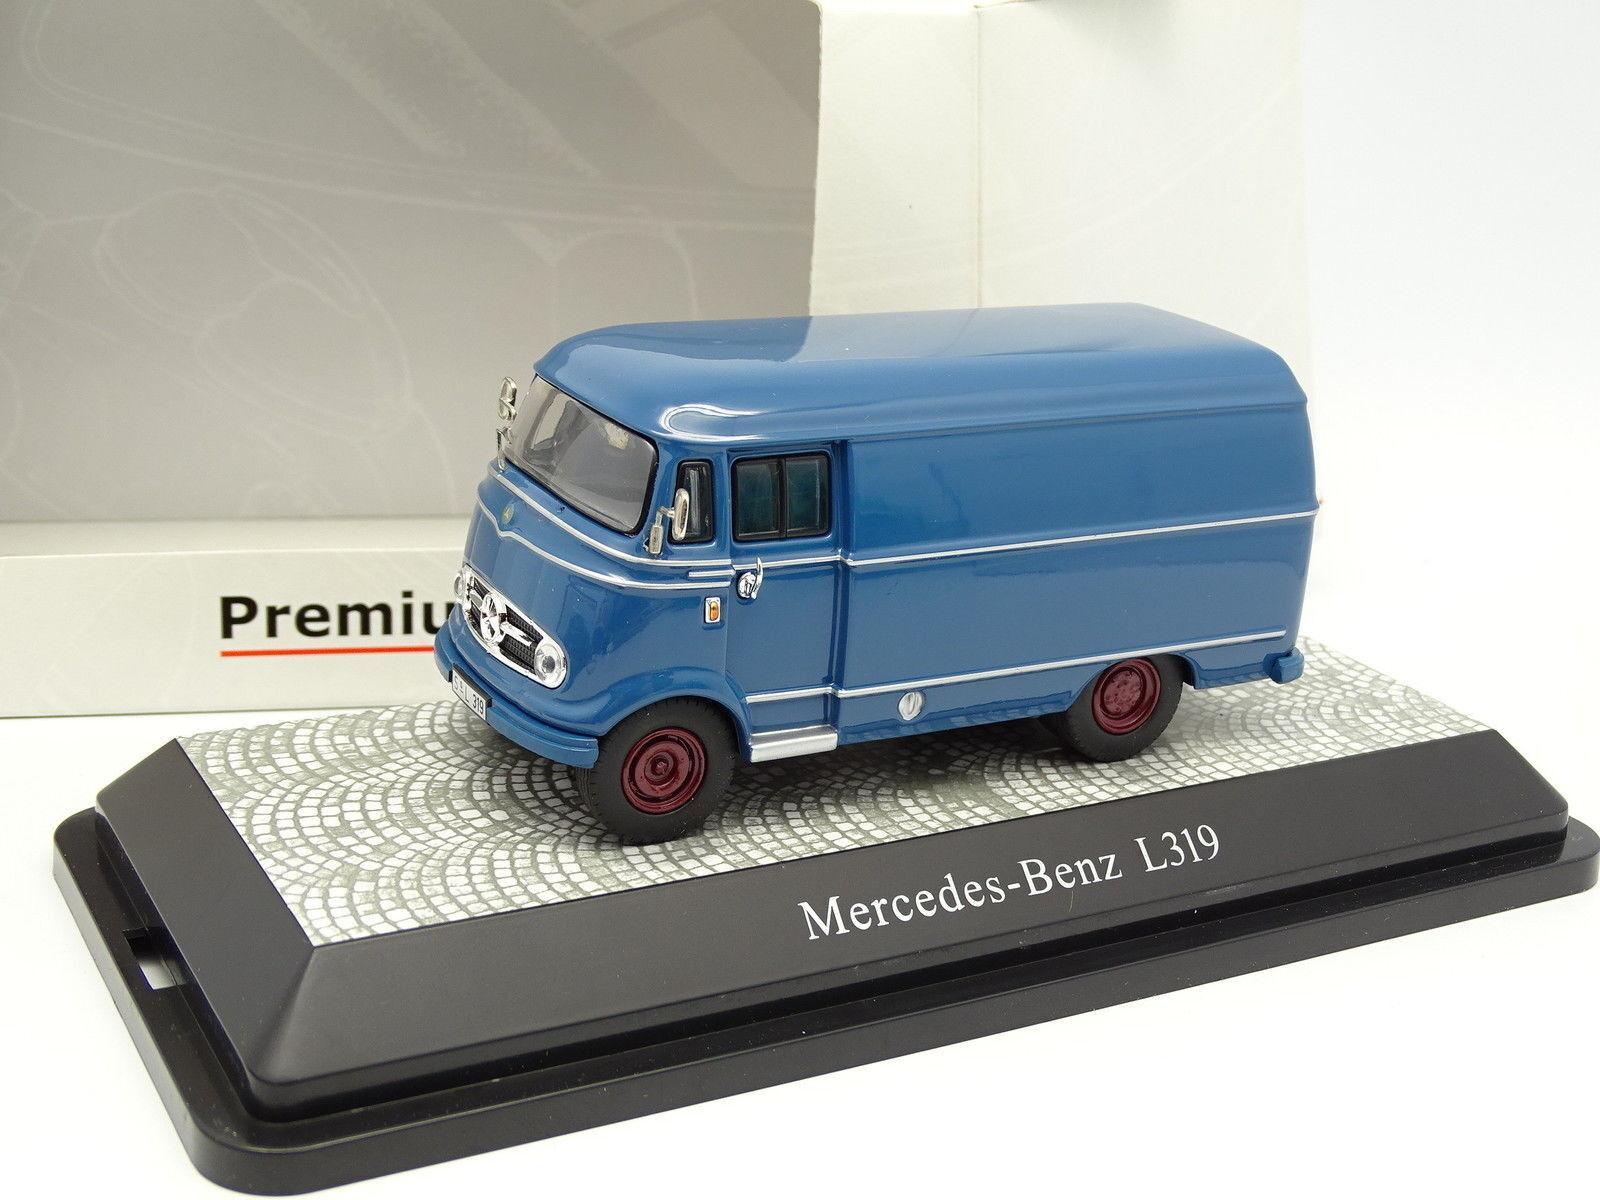 Premium classixxs 1 43 - mercedes l319 van bluee